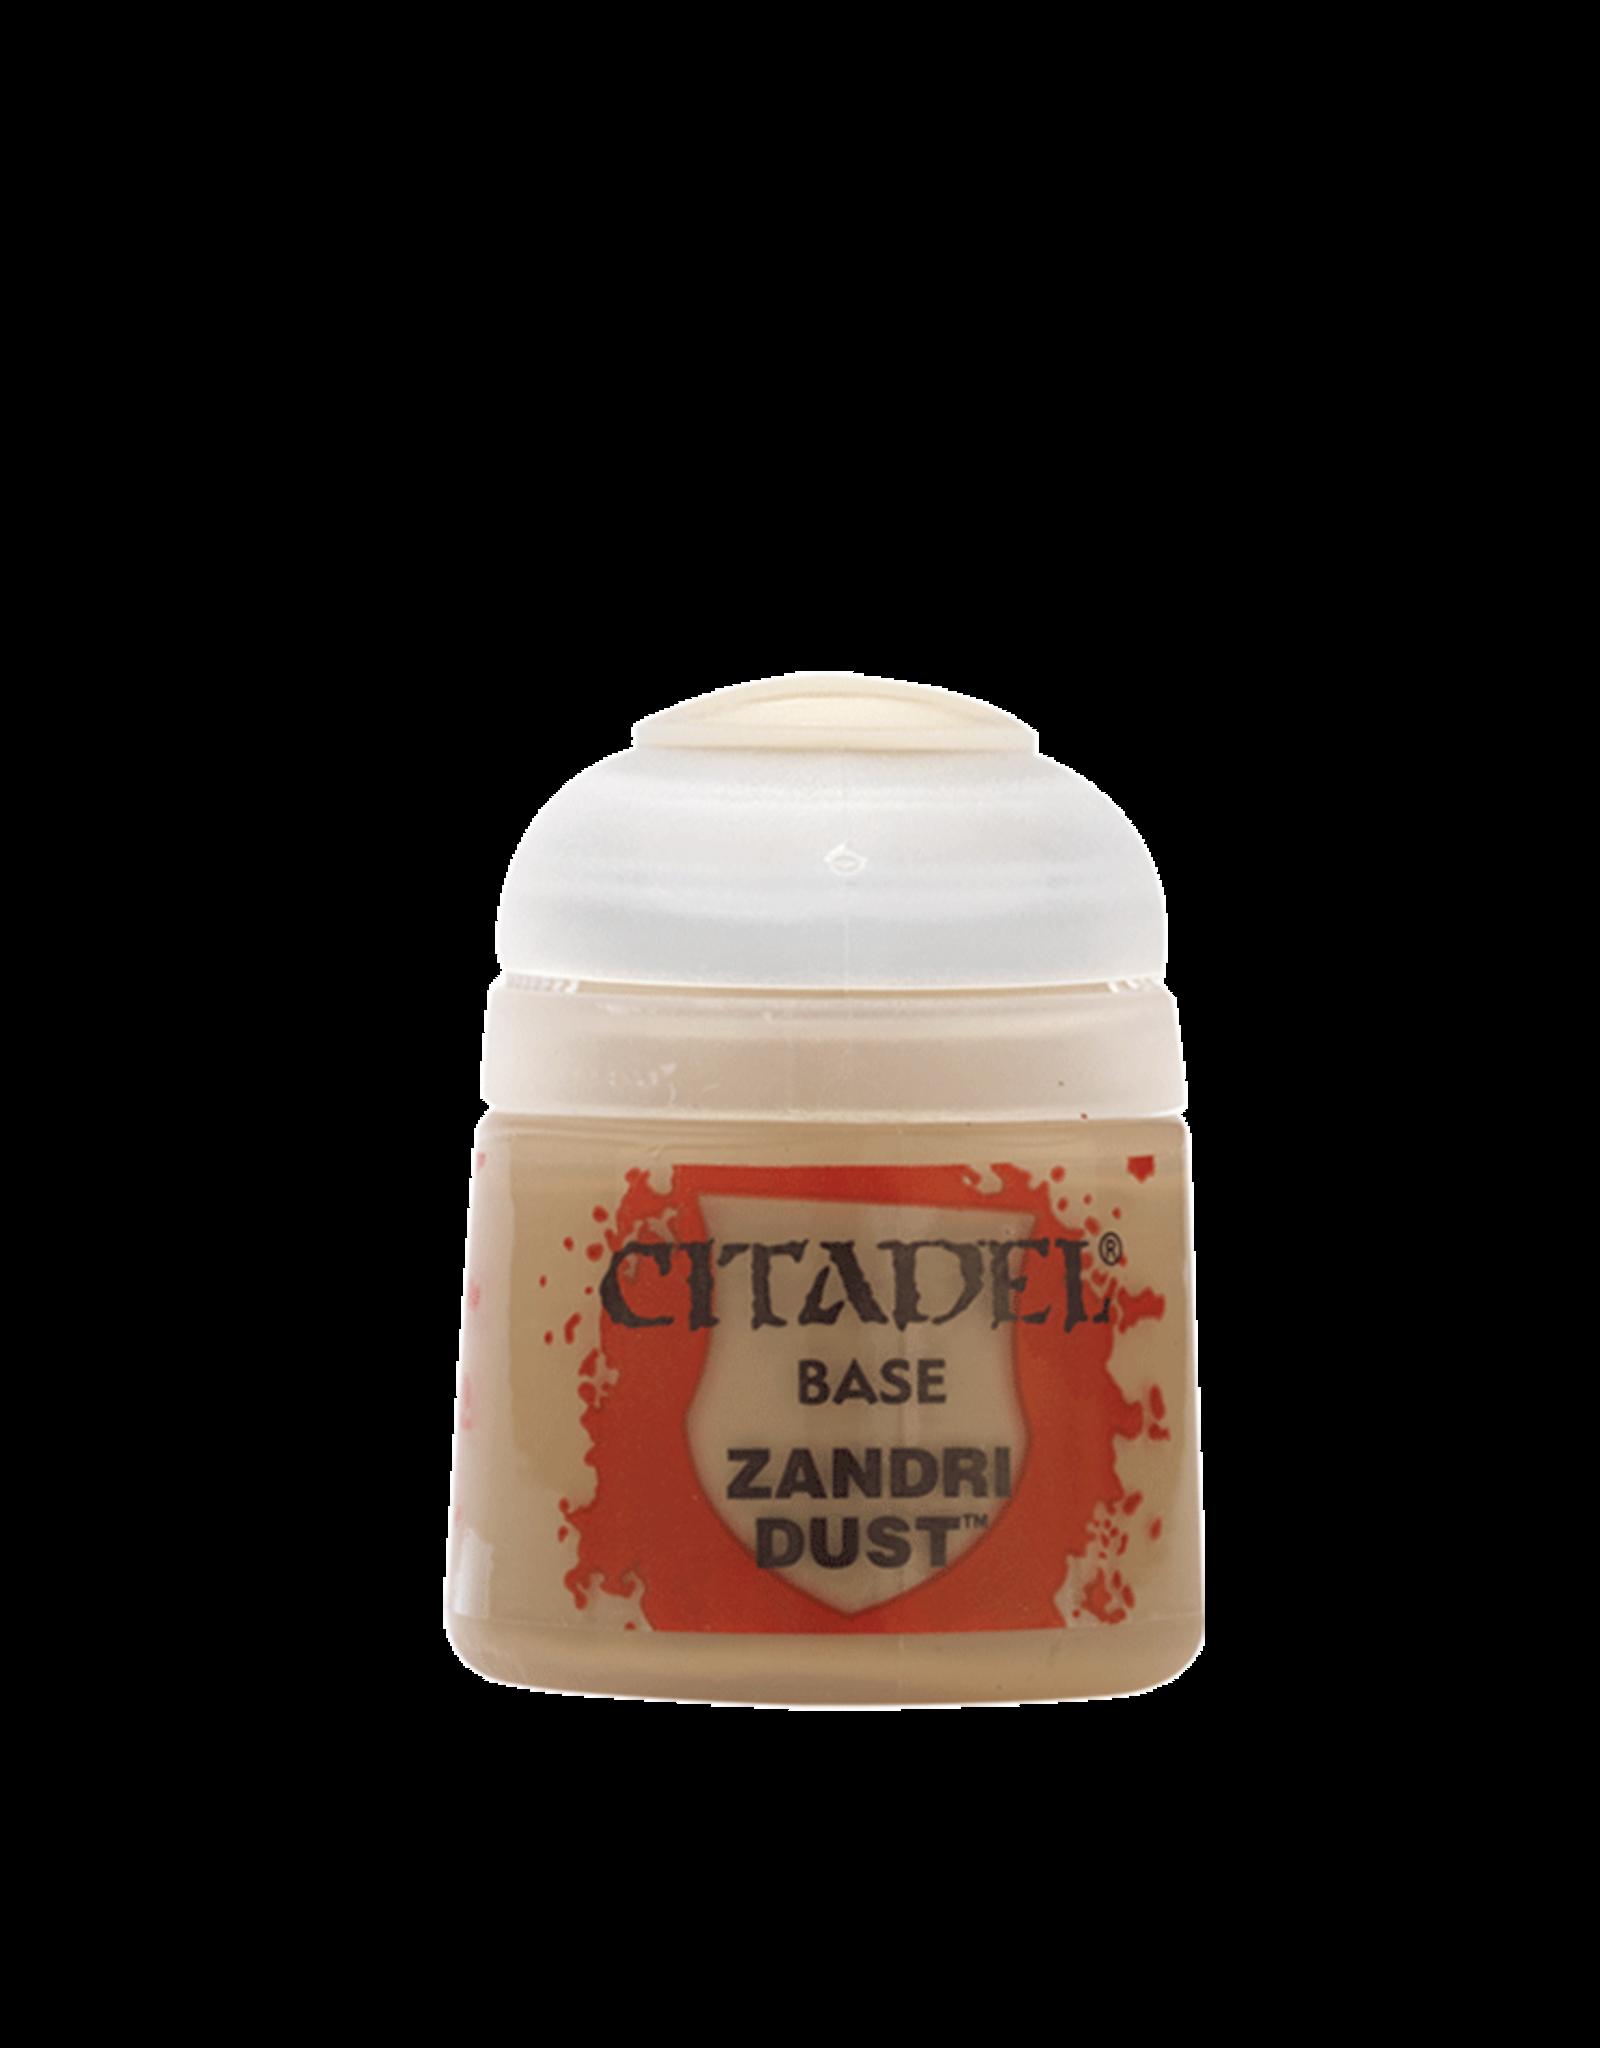 Citadel Citadel Base: Zandri Dust (12ml)